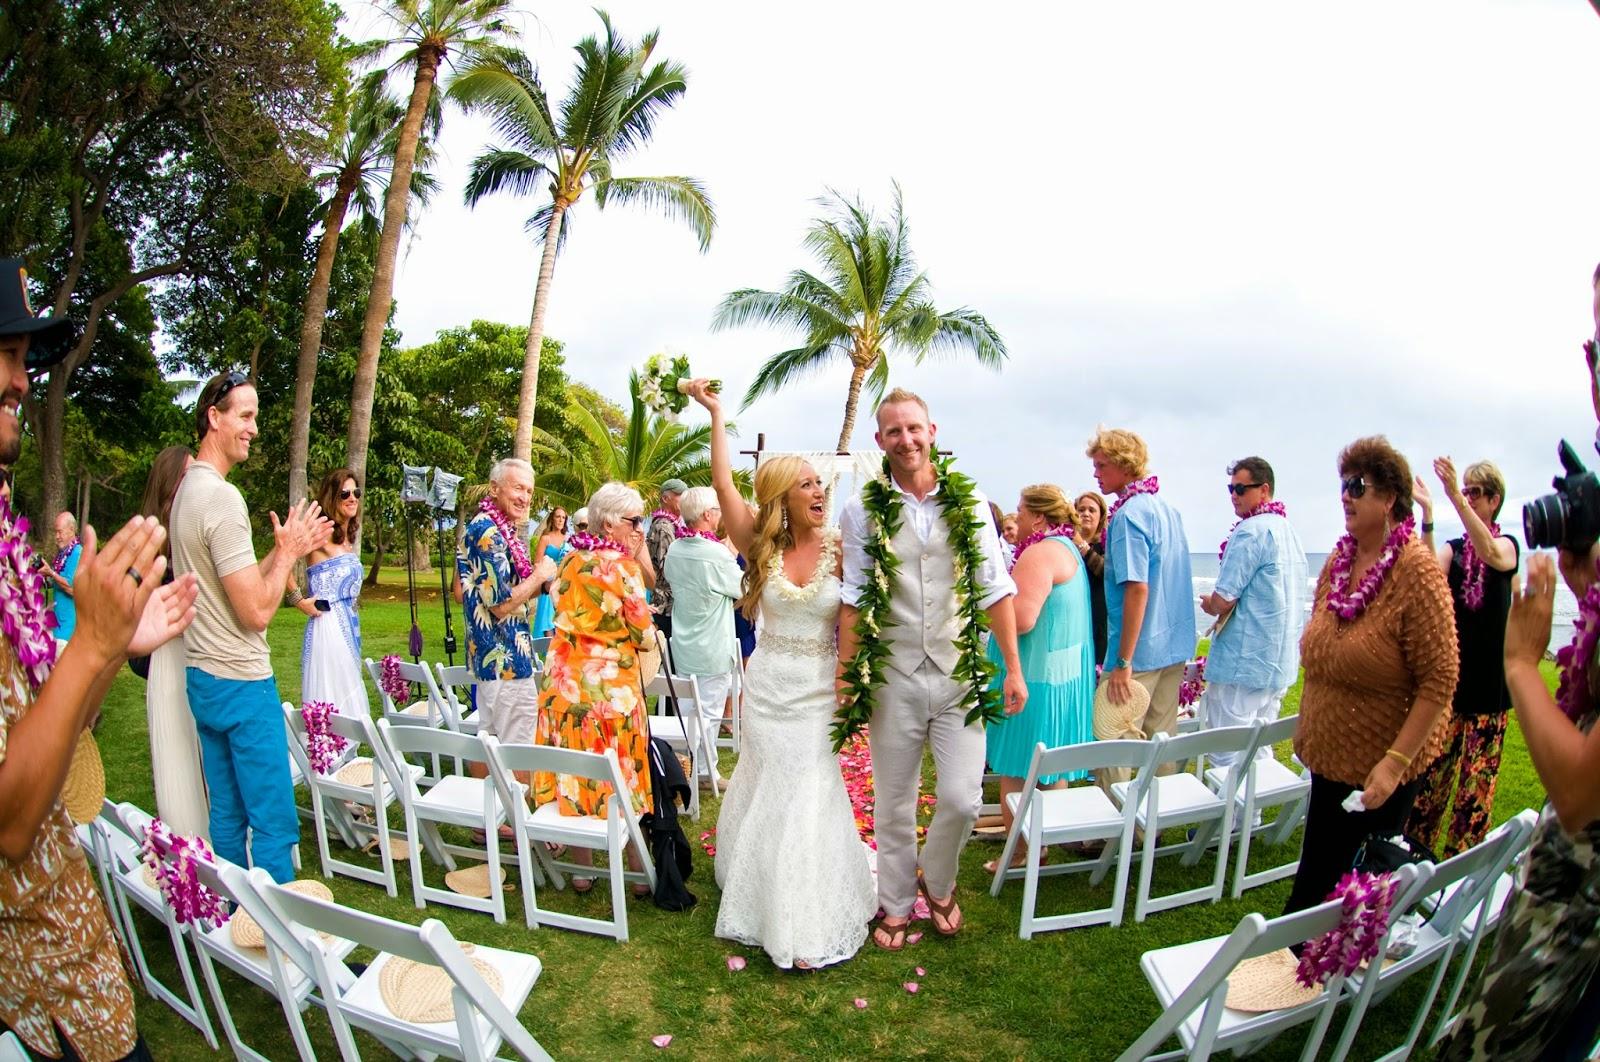 maui weddings, maui private estate weddings, maui wedding photographers, maui wedding planners, marry me maui